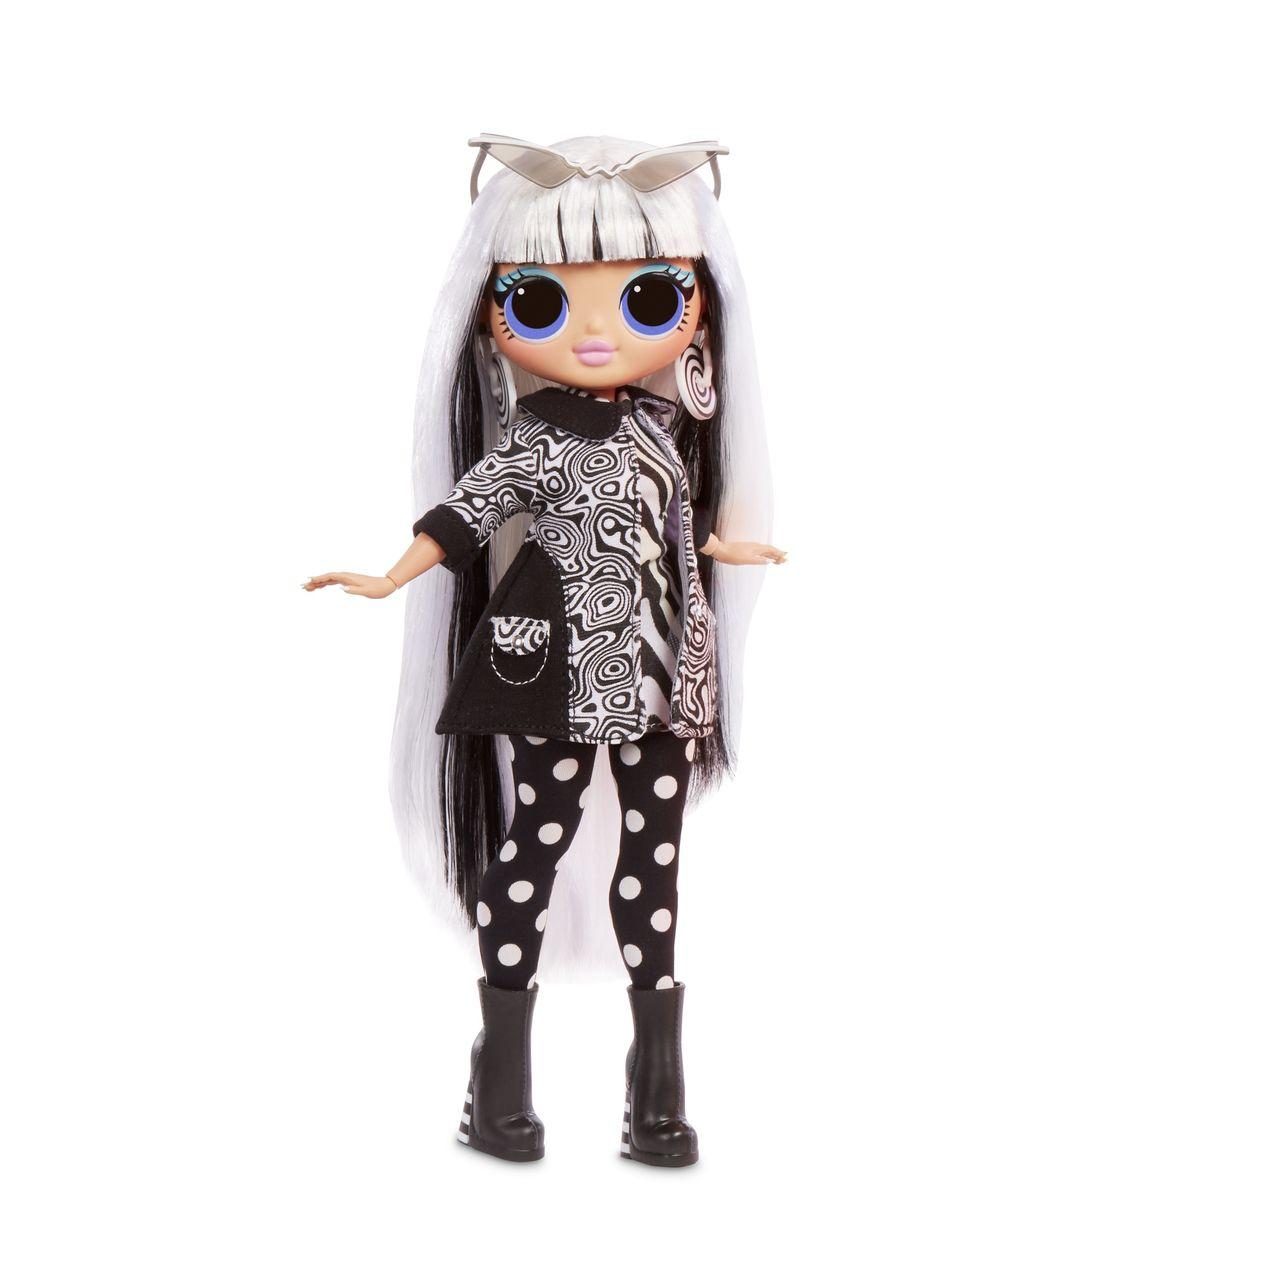 Boneca LOL Surprise! O.M.G.(Series Lights): Groovy Babe - Candide